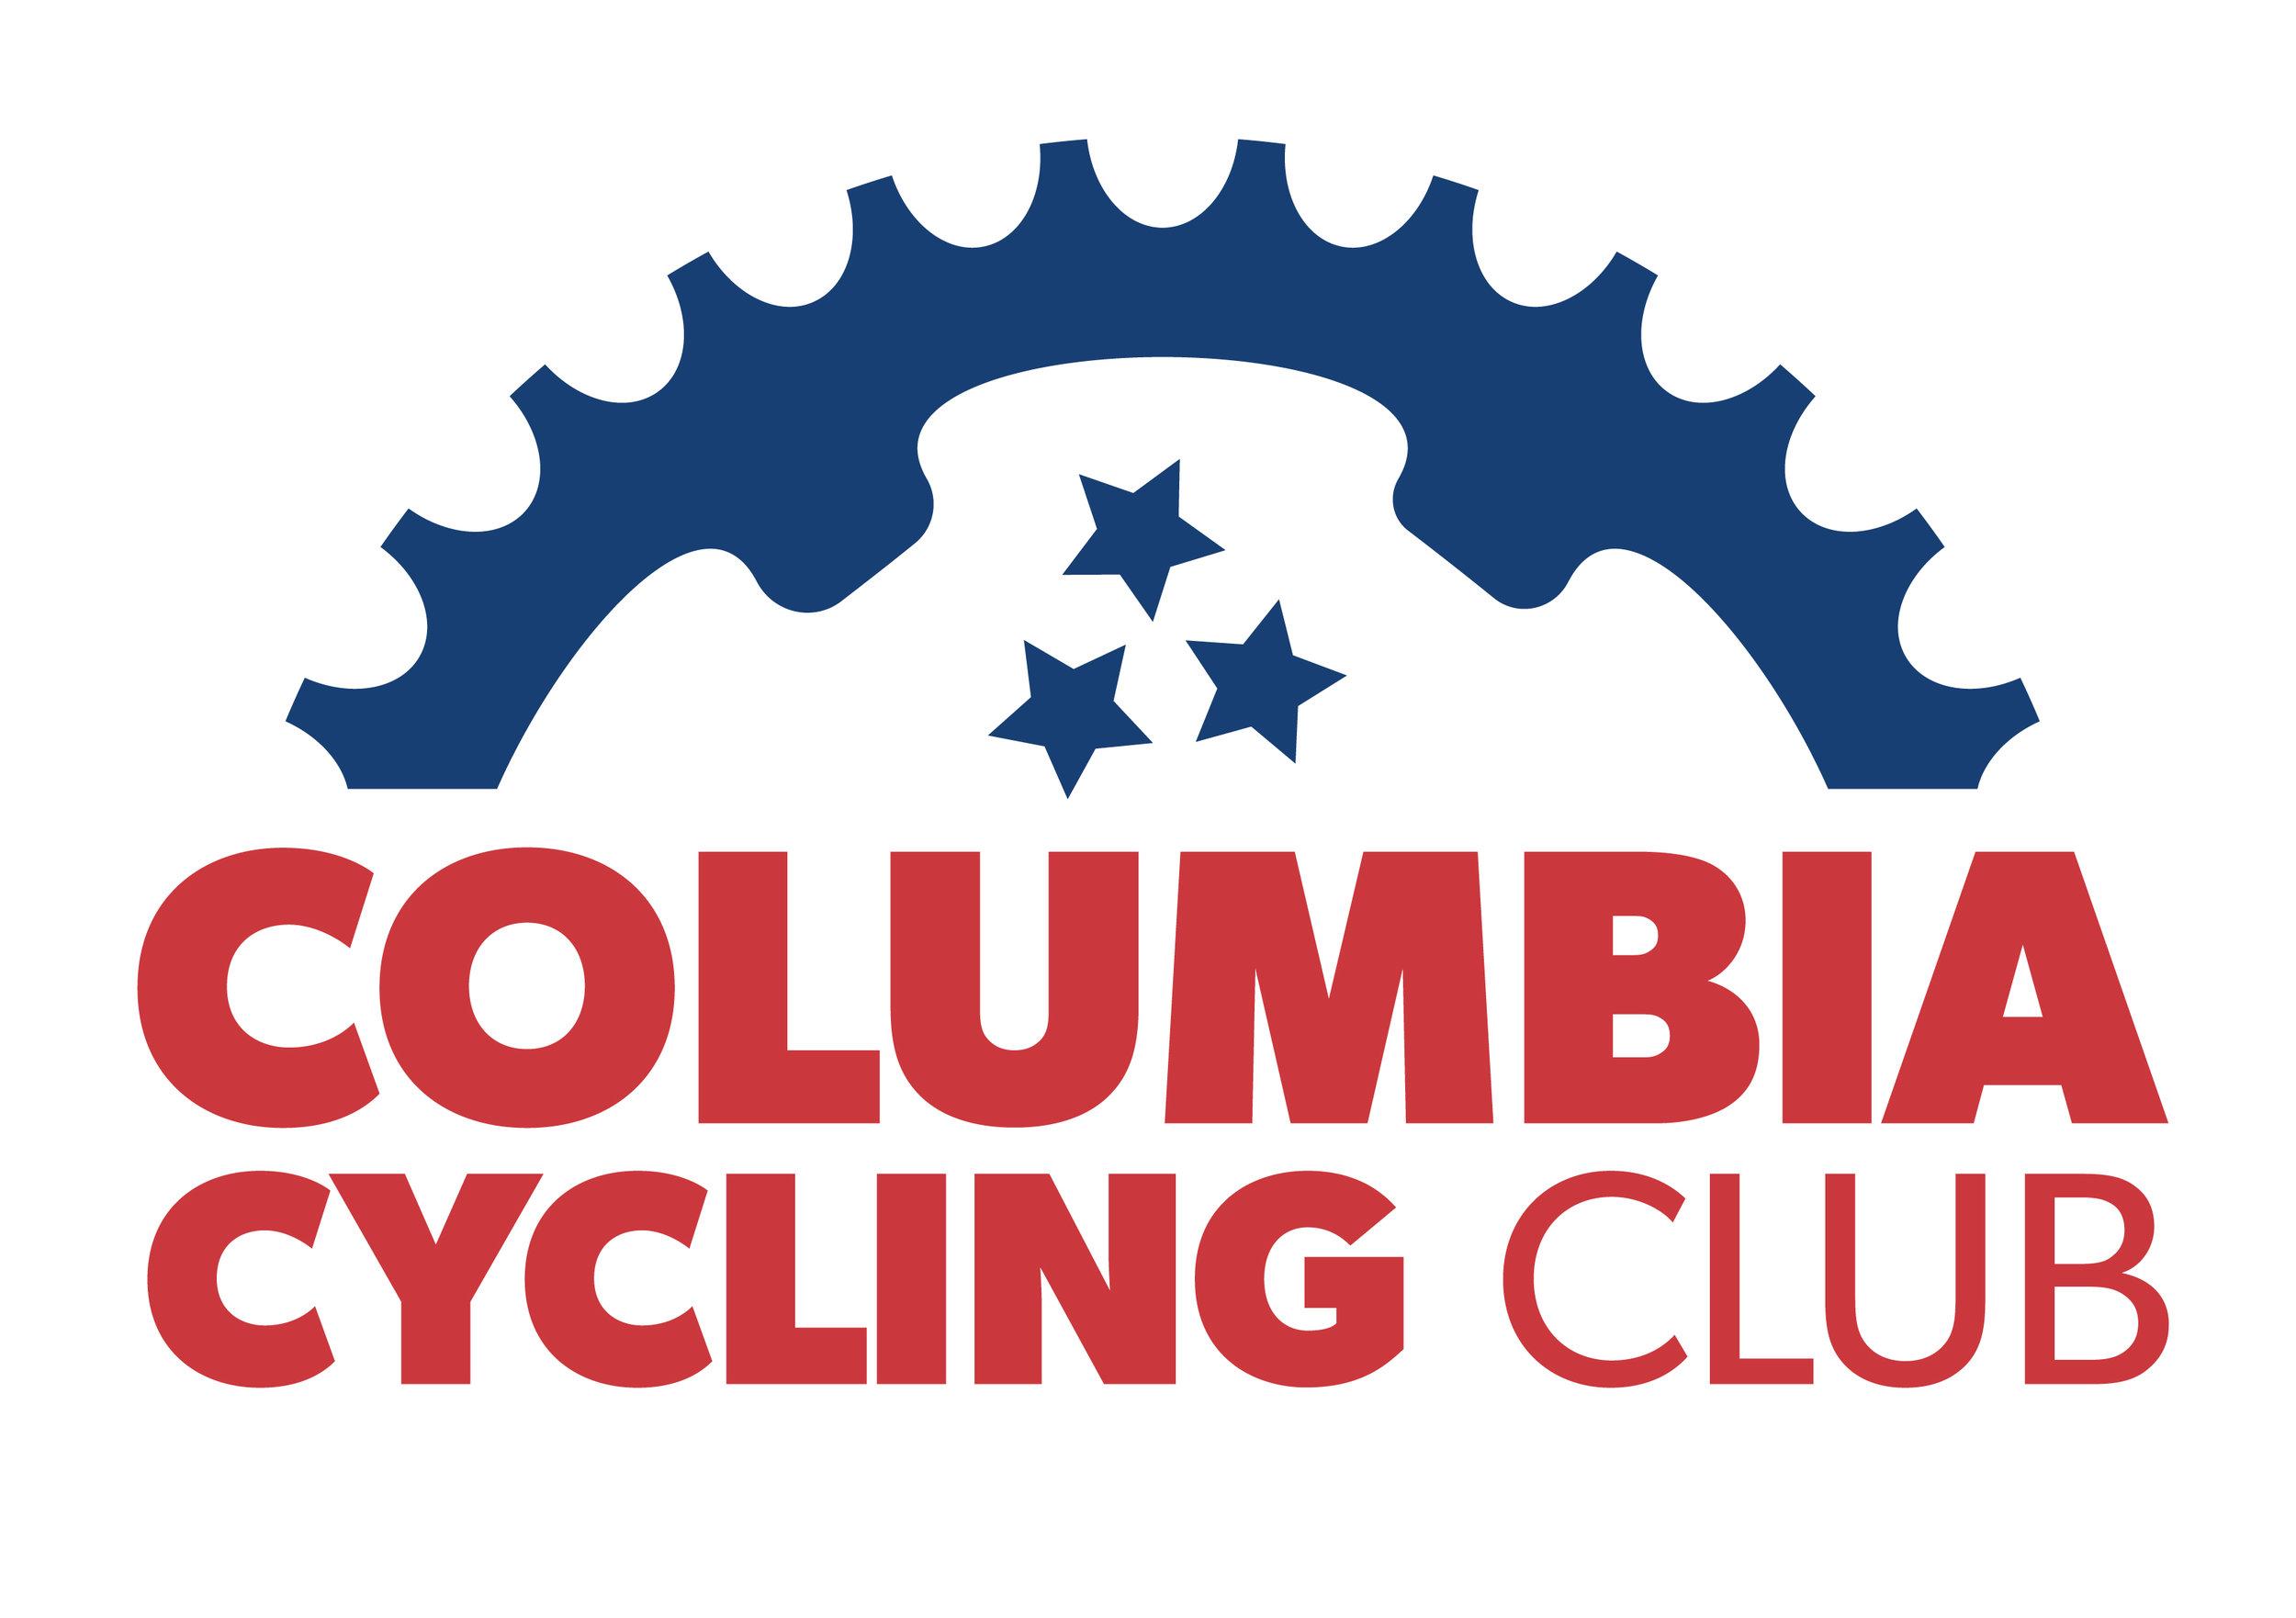 ccc-logo-03.jpg